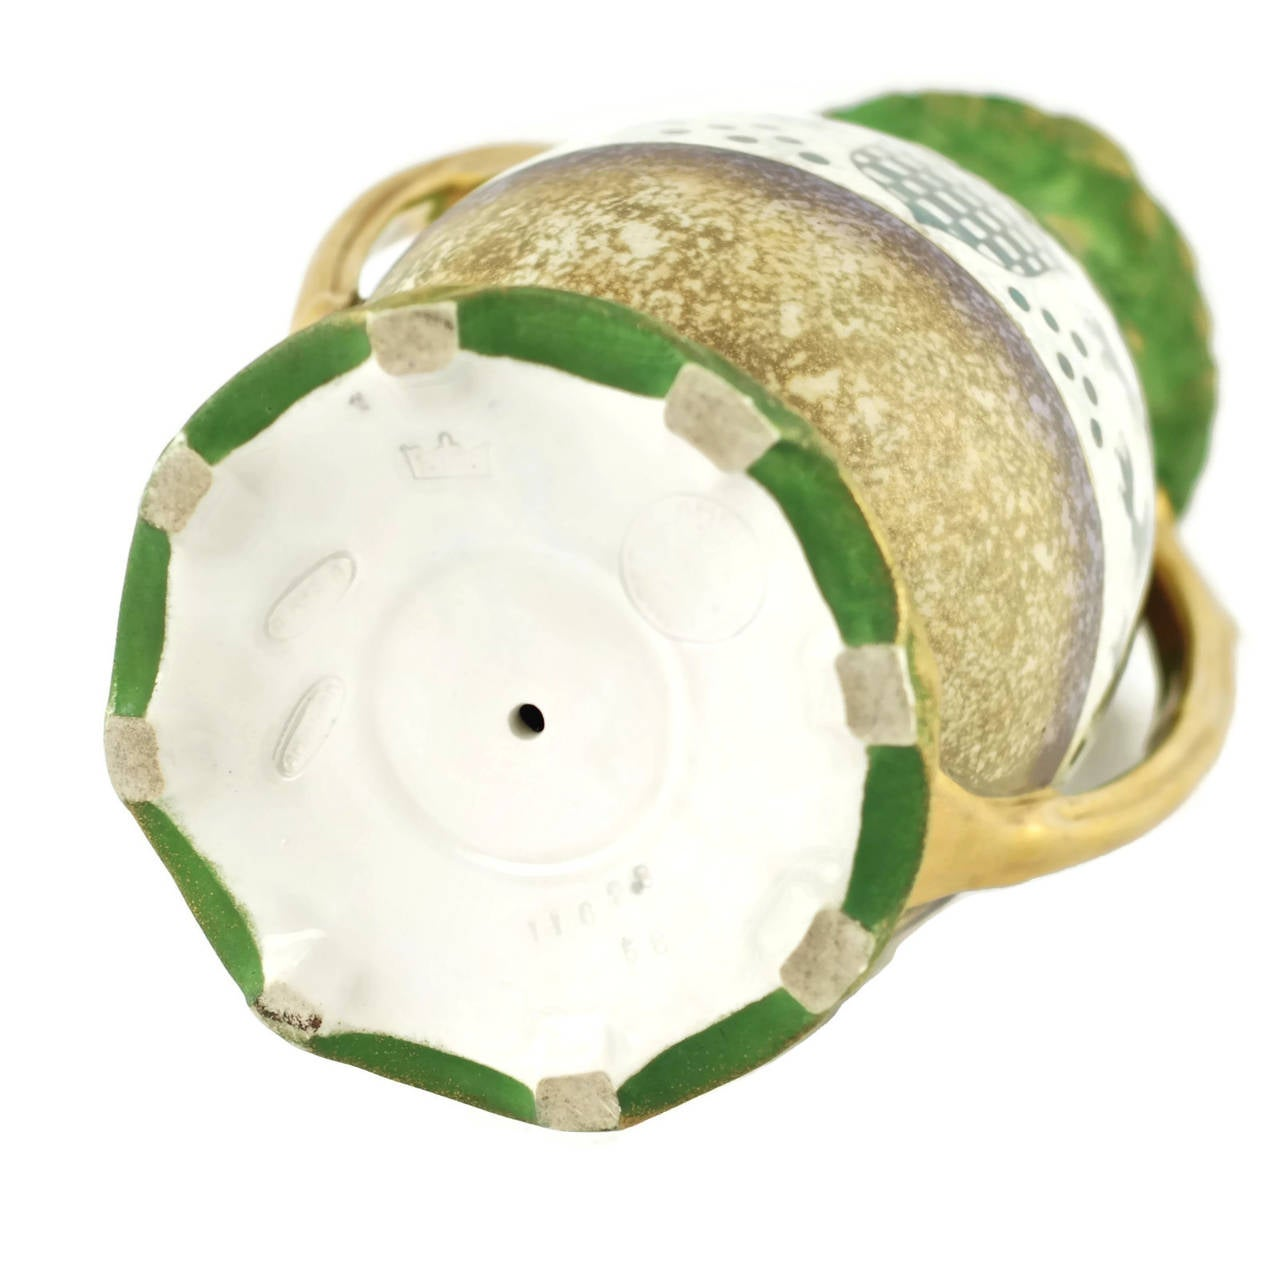 Porcelain Riessner & Kessel Amphora Turn Teplitz Two-Handled Vase with Iridized Glaze For Sale